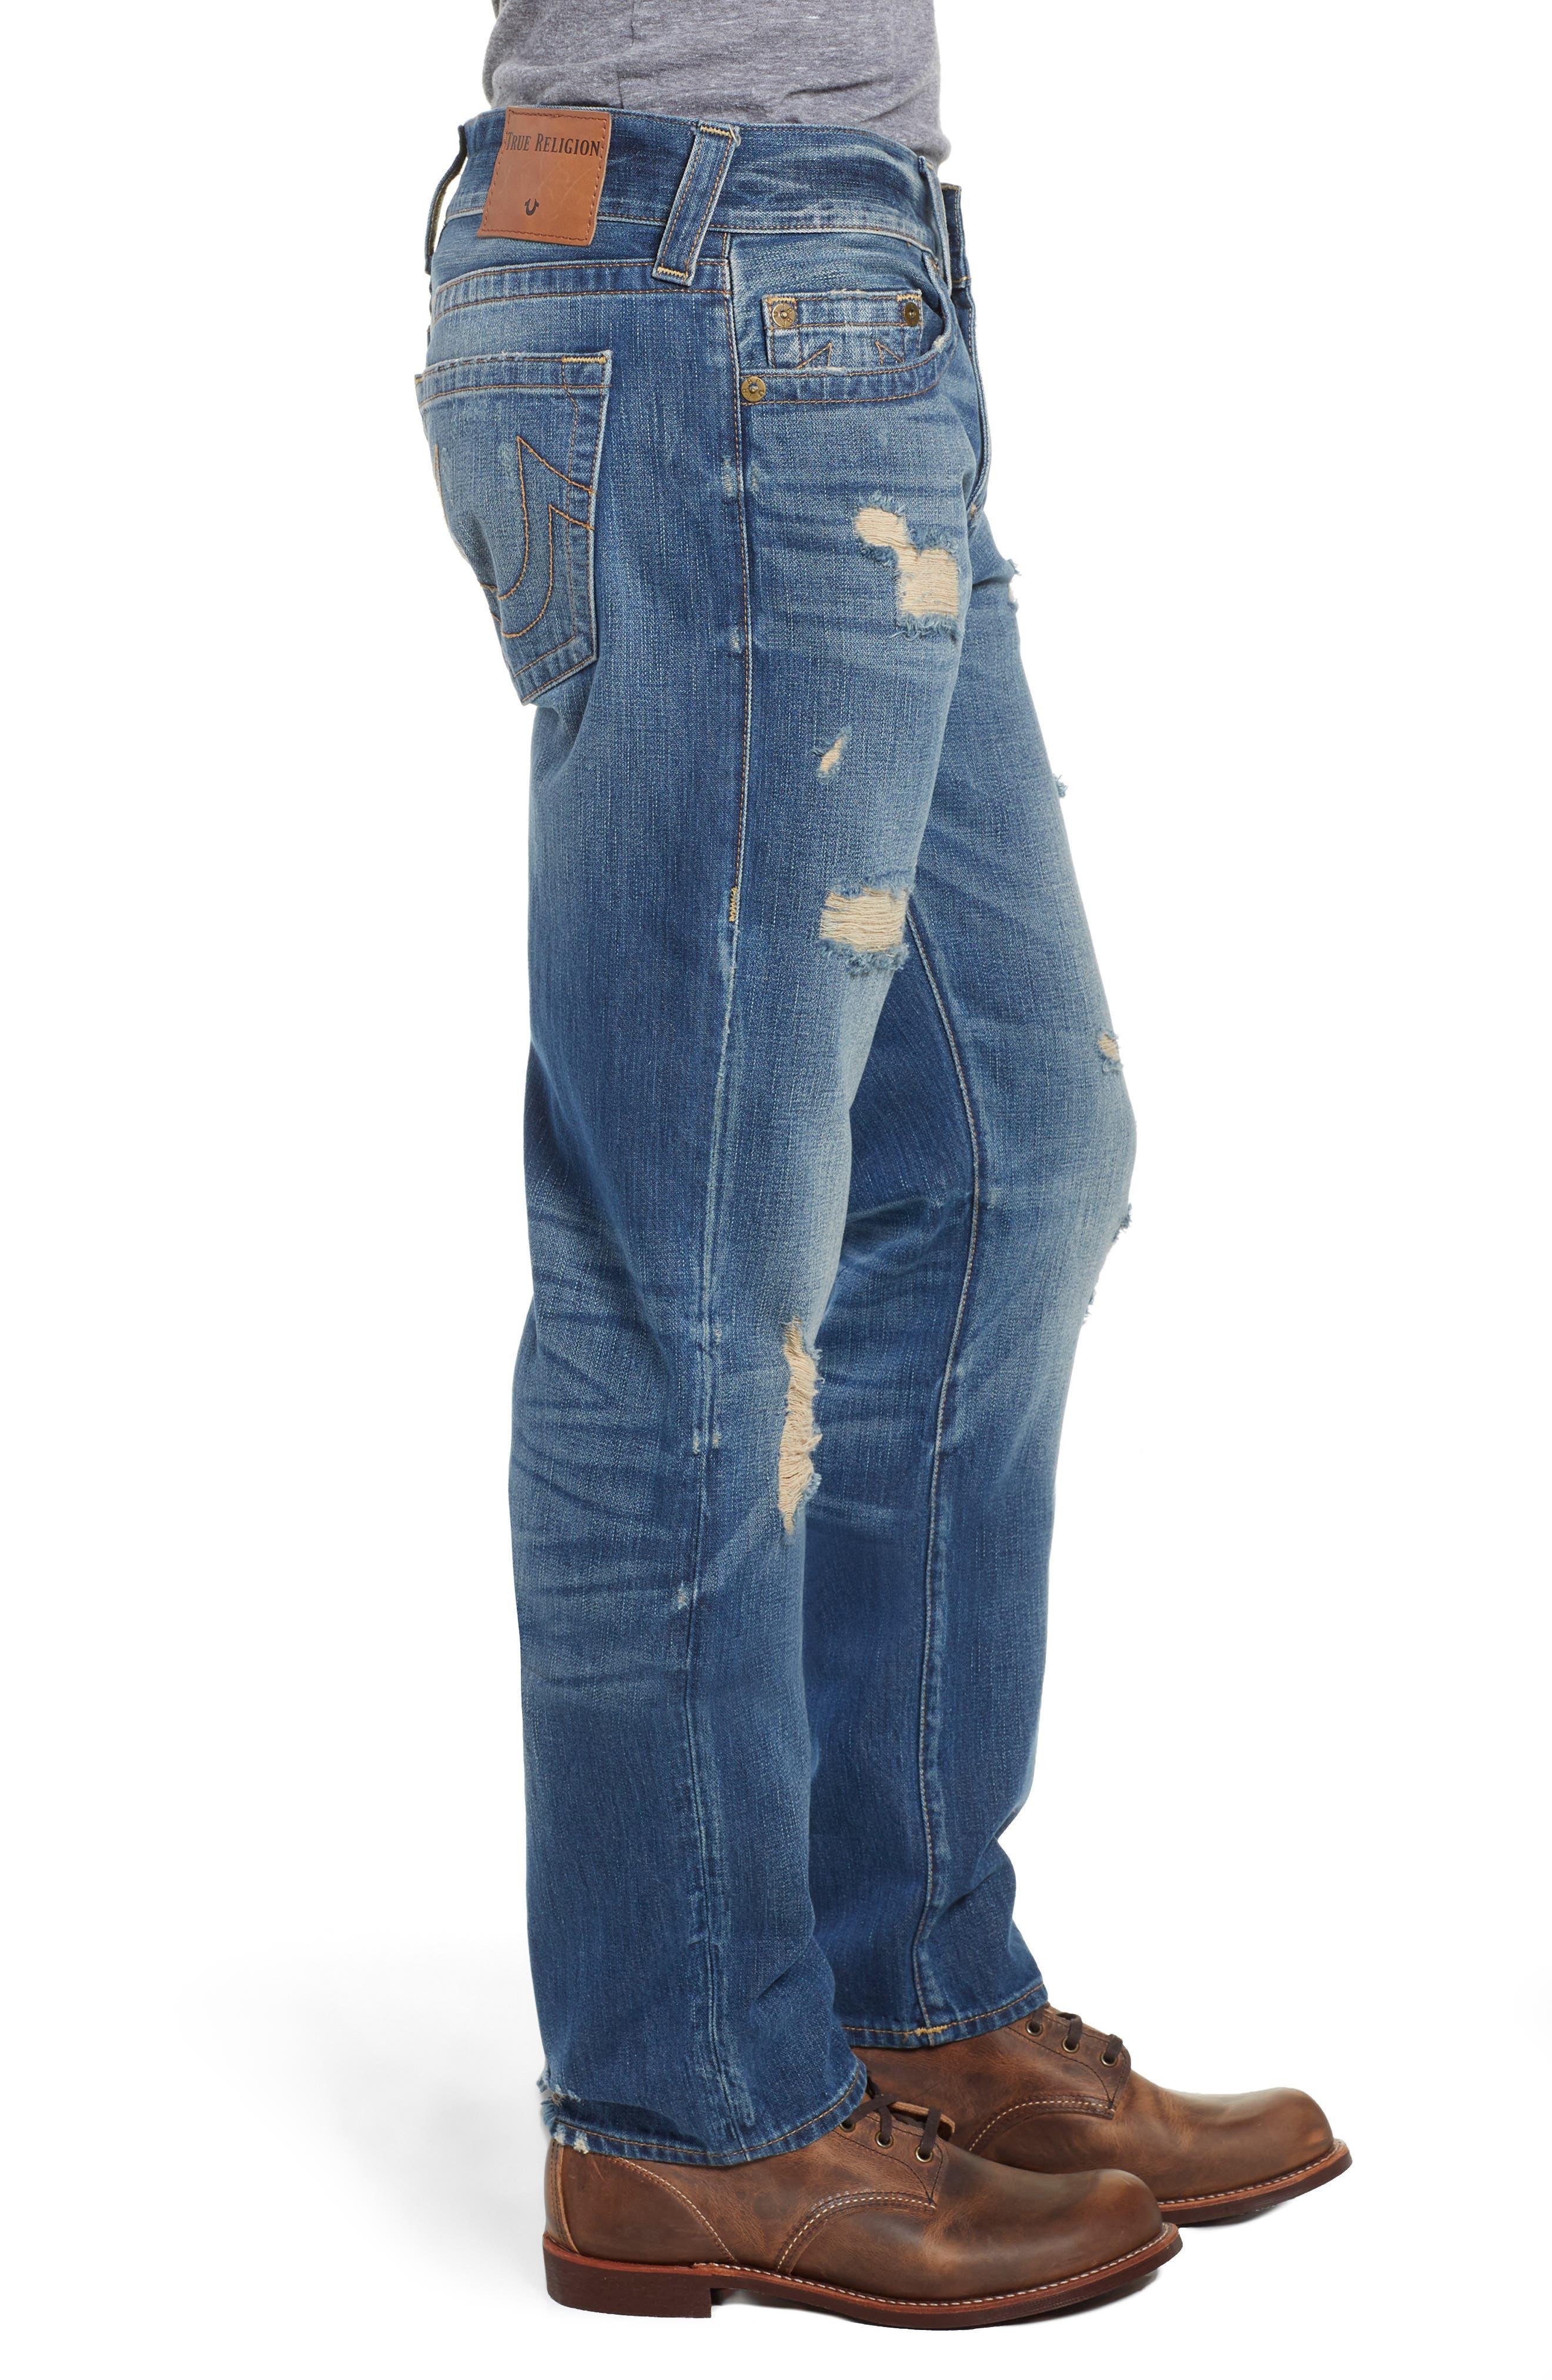 TRUE RELIGION BRAND JEANS,                             Geno Straight Leg Jeans,                             Alternate thumbnail 3, color,                             WORN REBEL